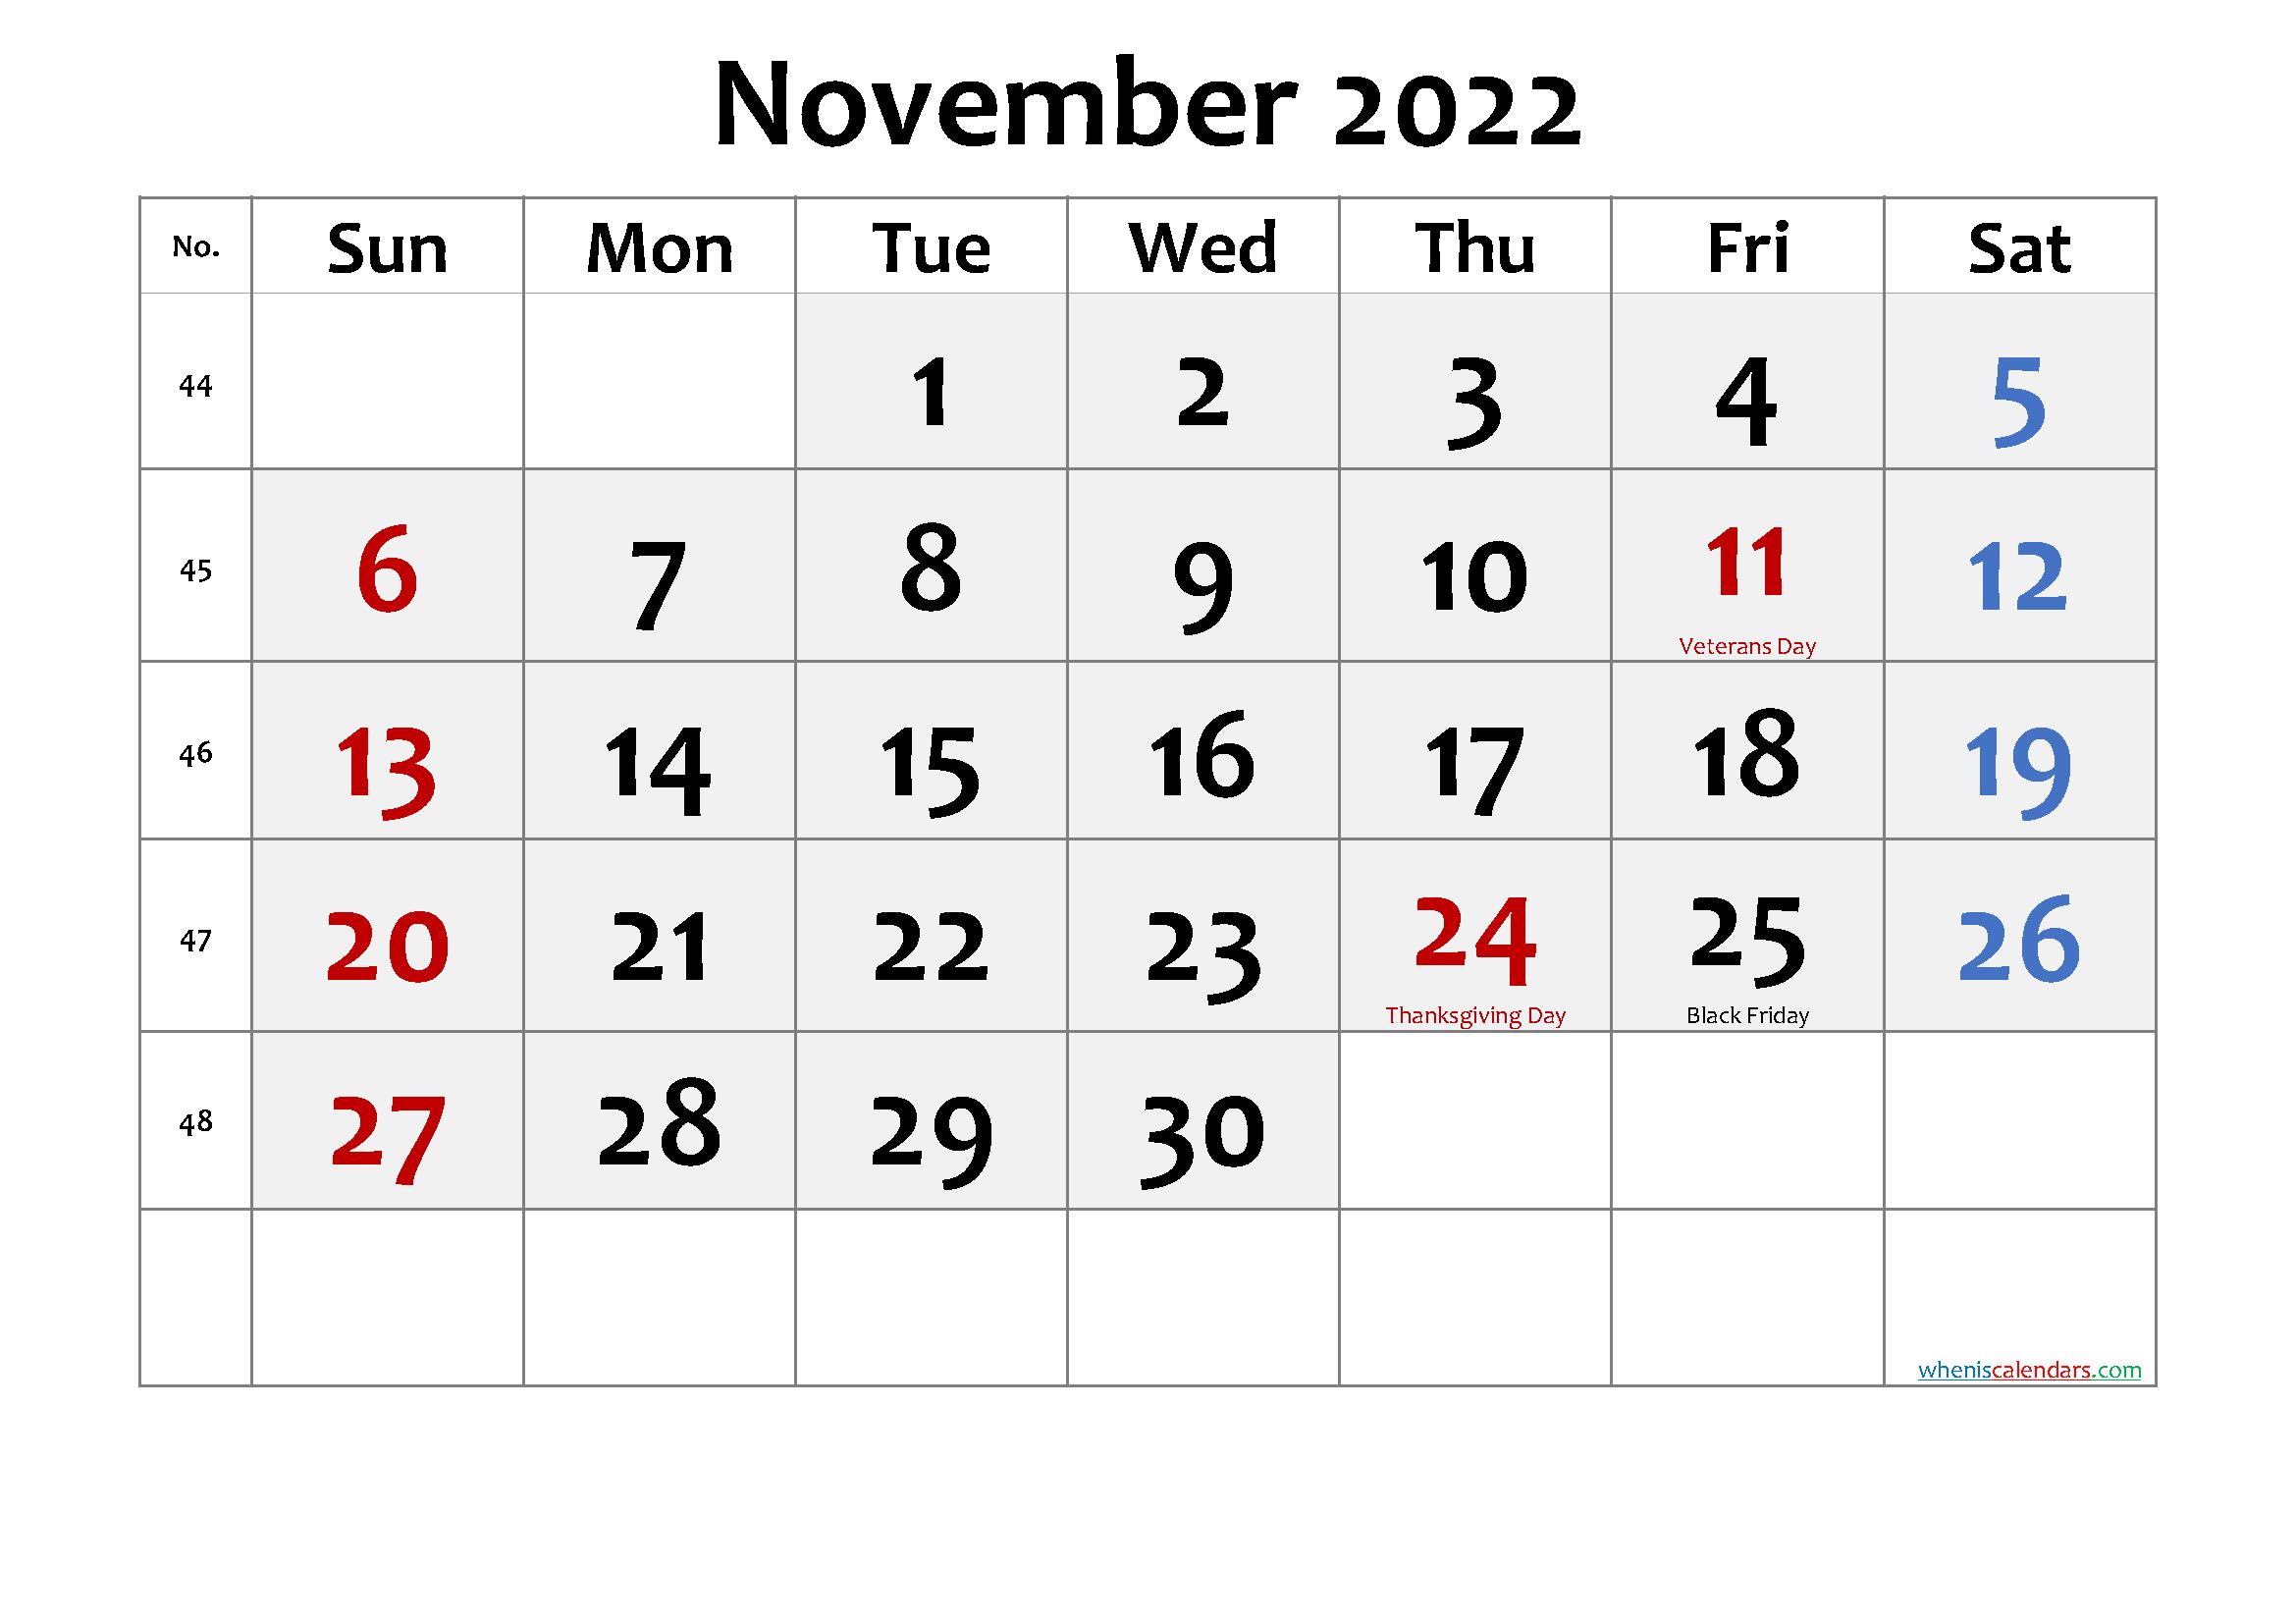 Printable November 2022 Calendar.Free Printable November 2022 Calendar With Holidays Free Printable 2021 Monthly Calendar With Holidays